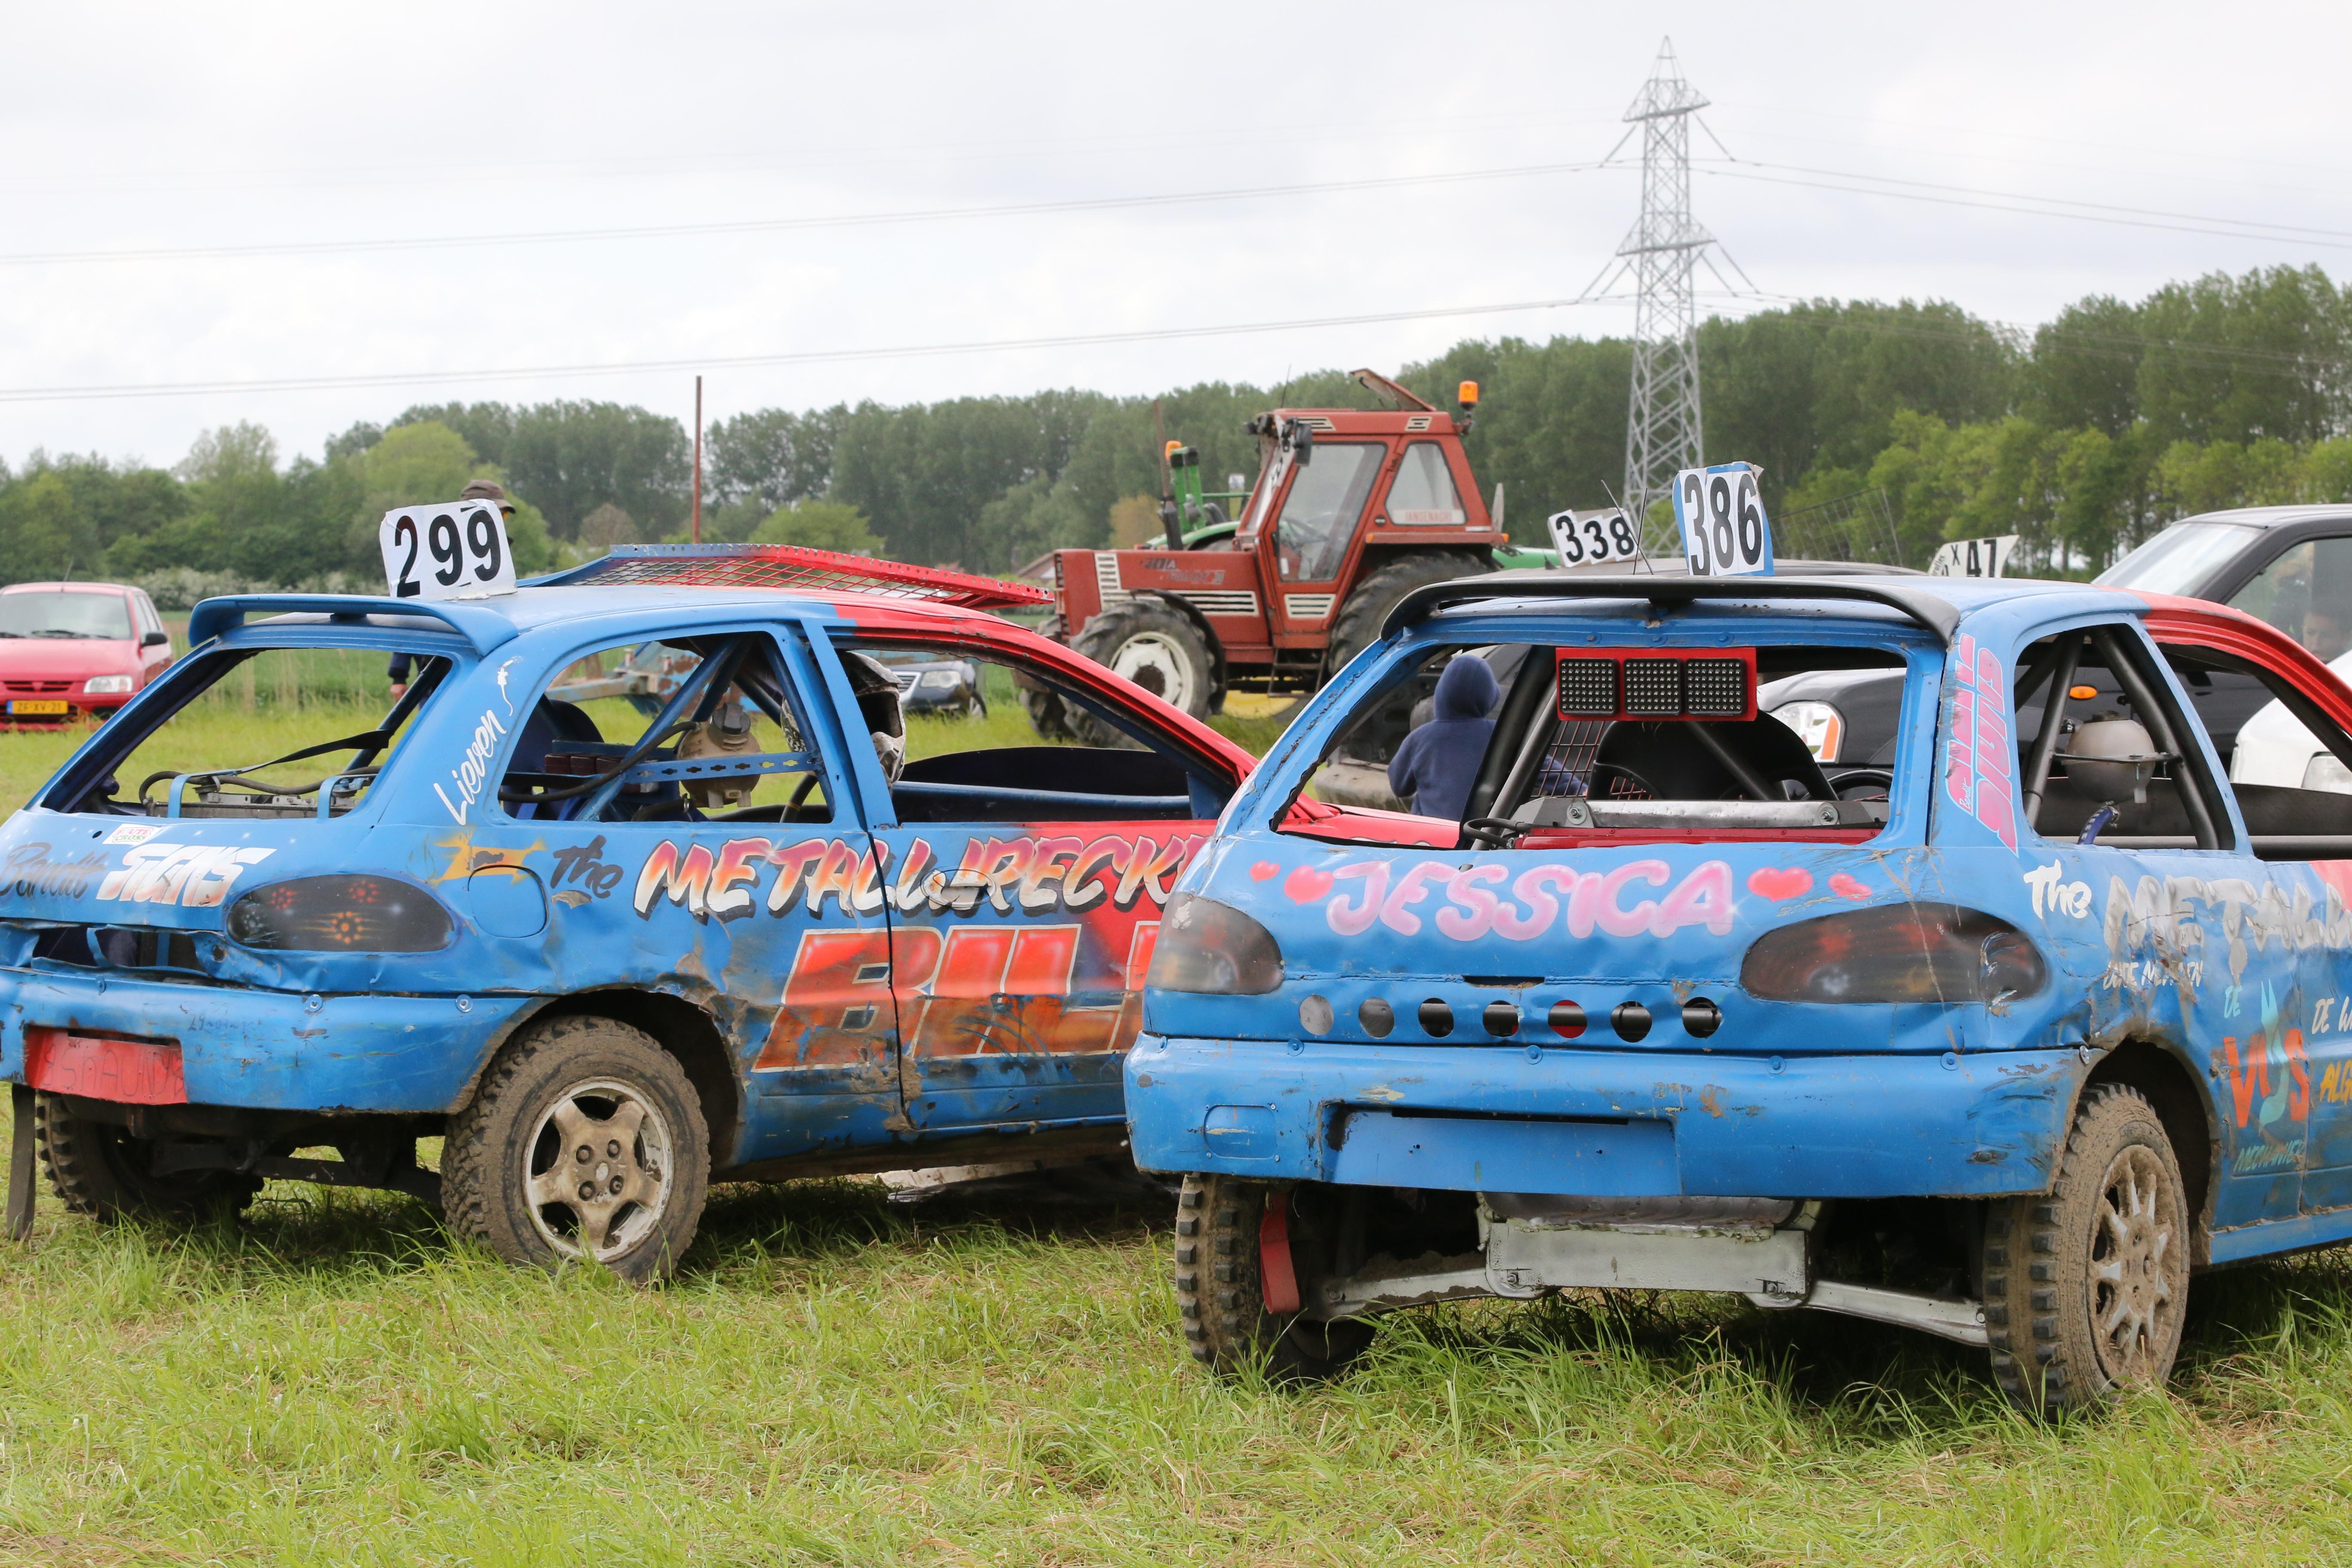 autocross sluiskil 14-5-2016 297